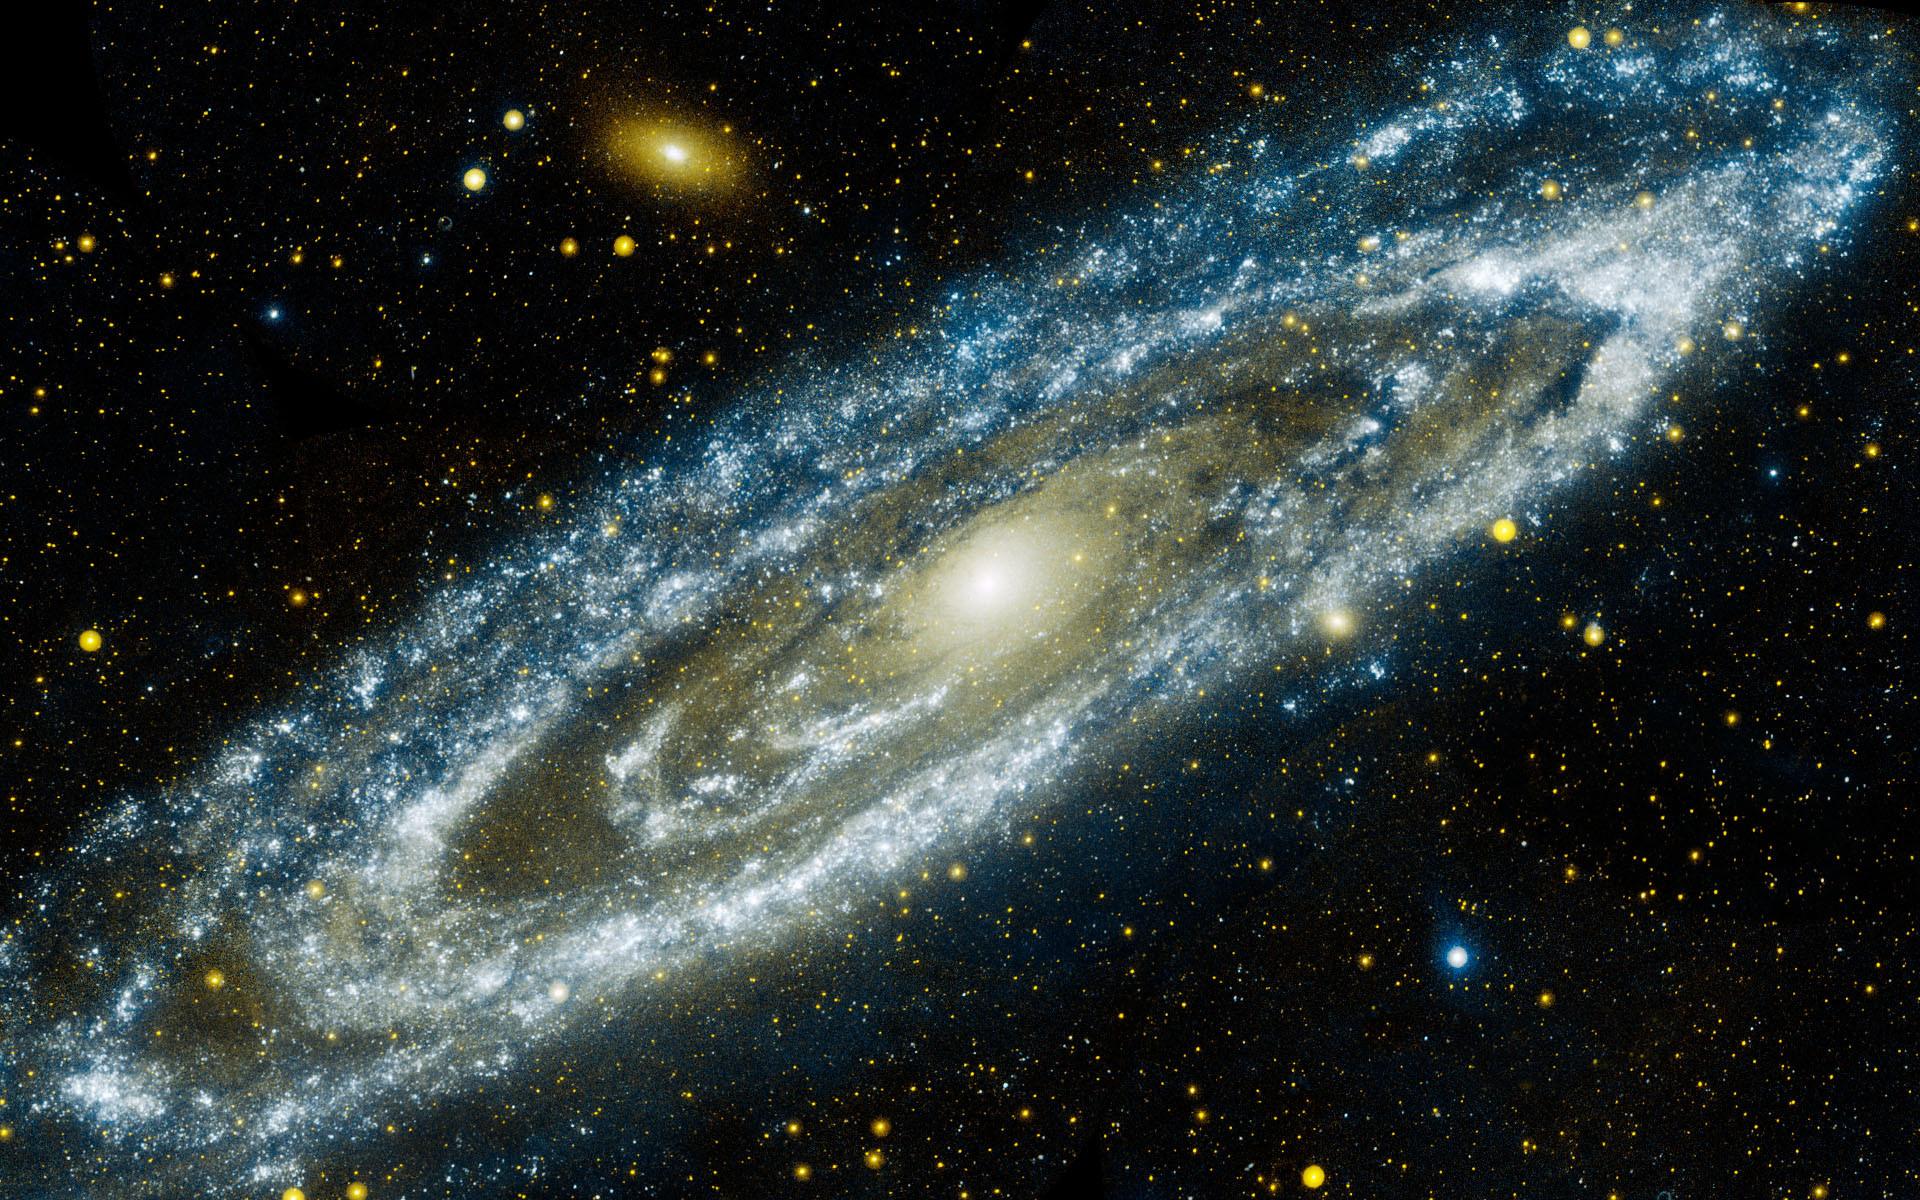 Galaxy Wallpaper, Space Galaxy Desktop Theme | HD Desktop Wallpapers